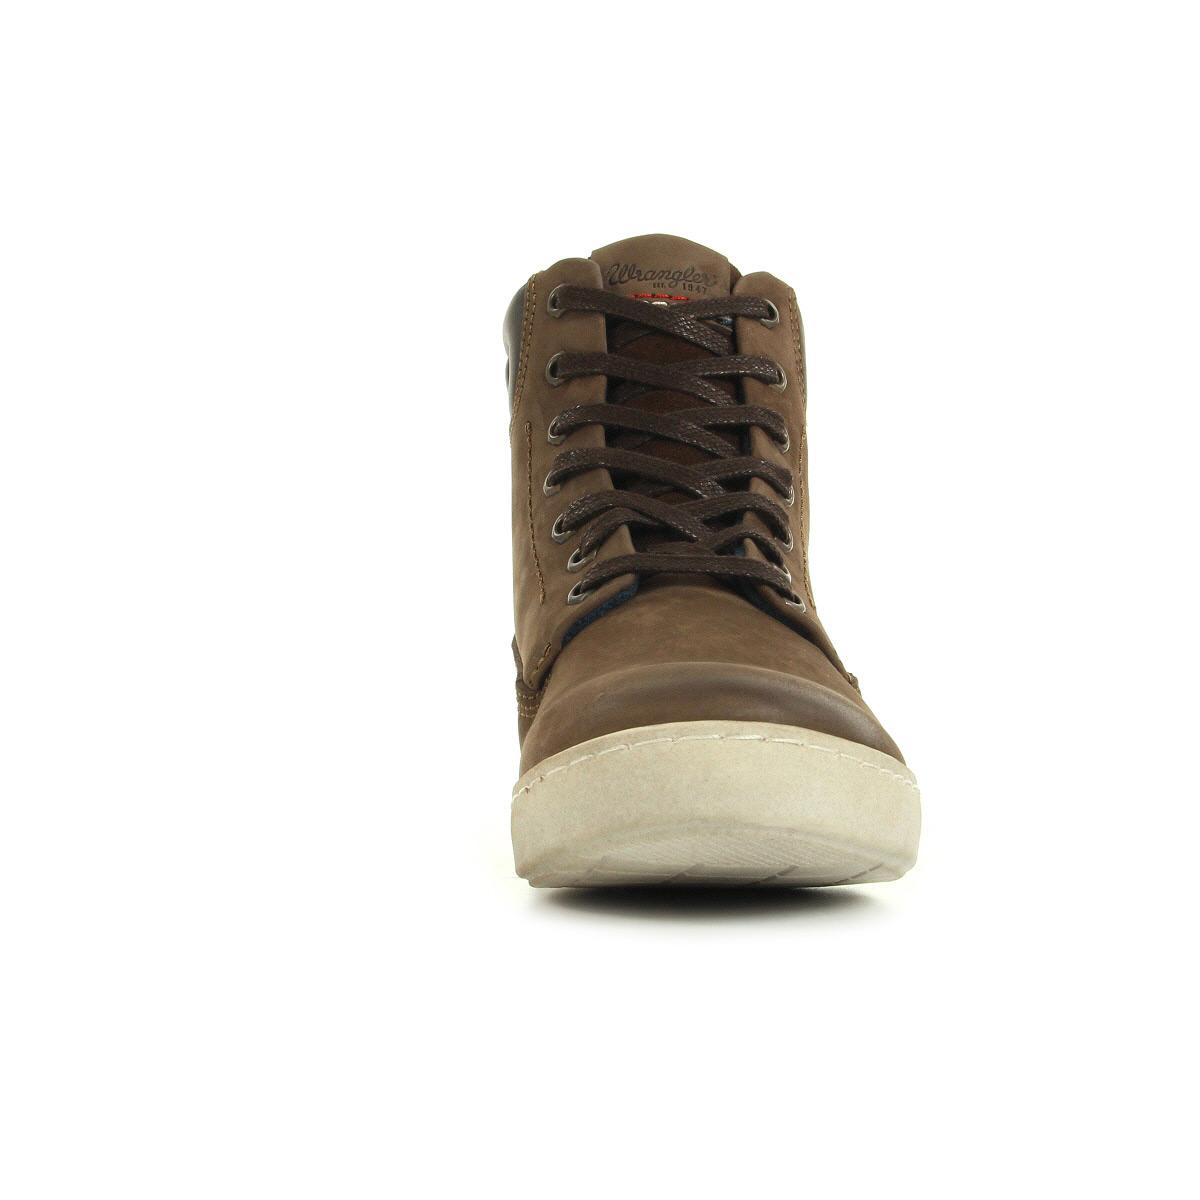 Wrangler Billy Brown WL15261030, Boots femme